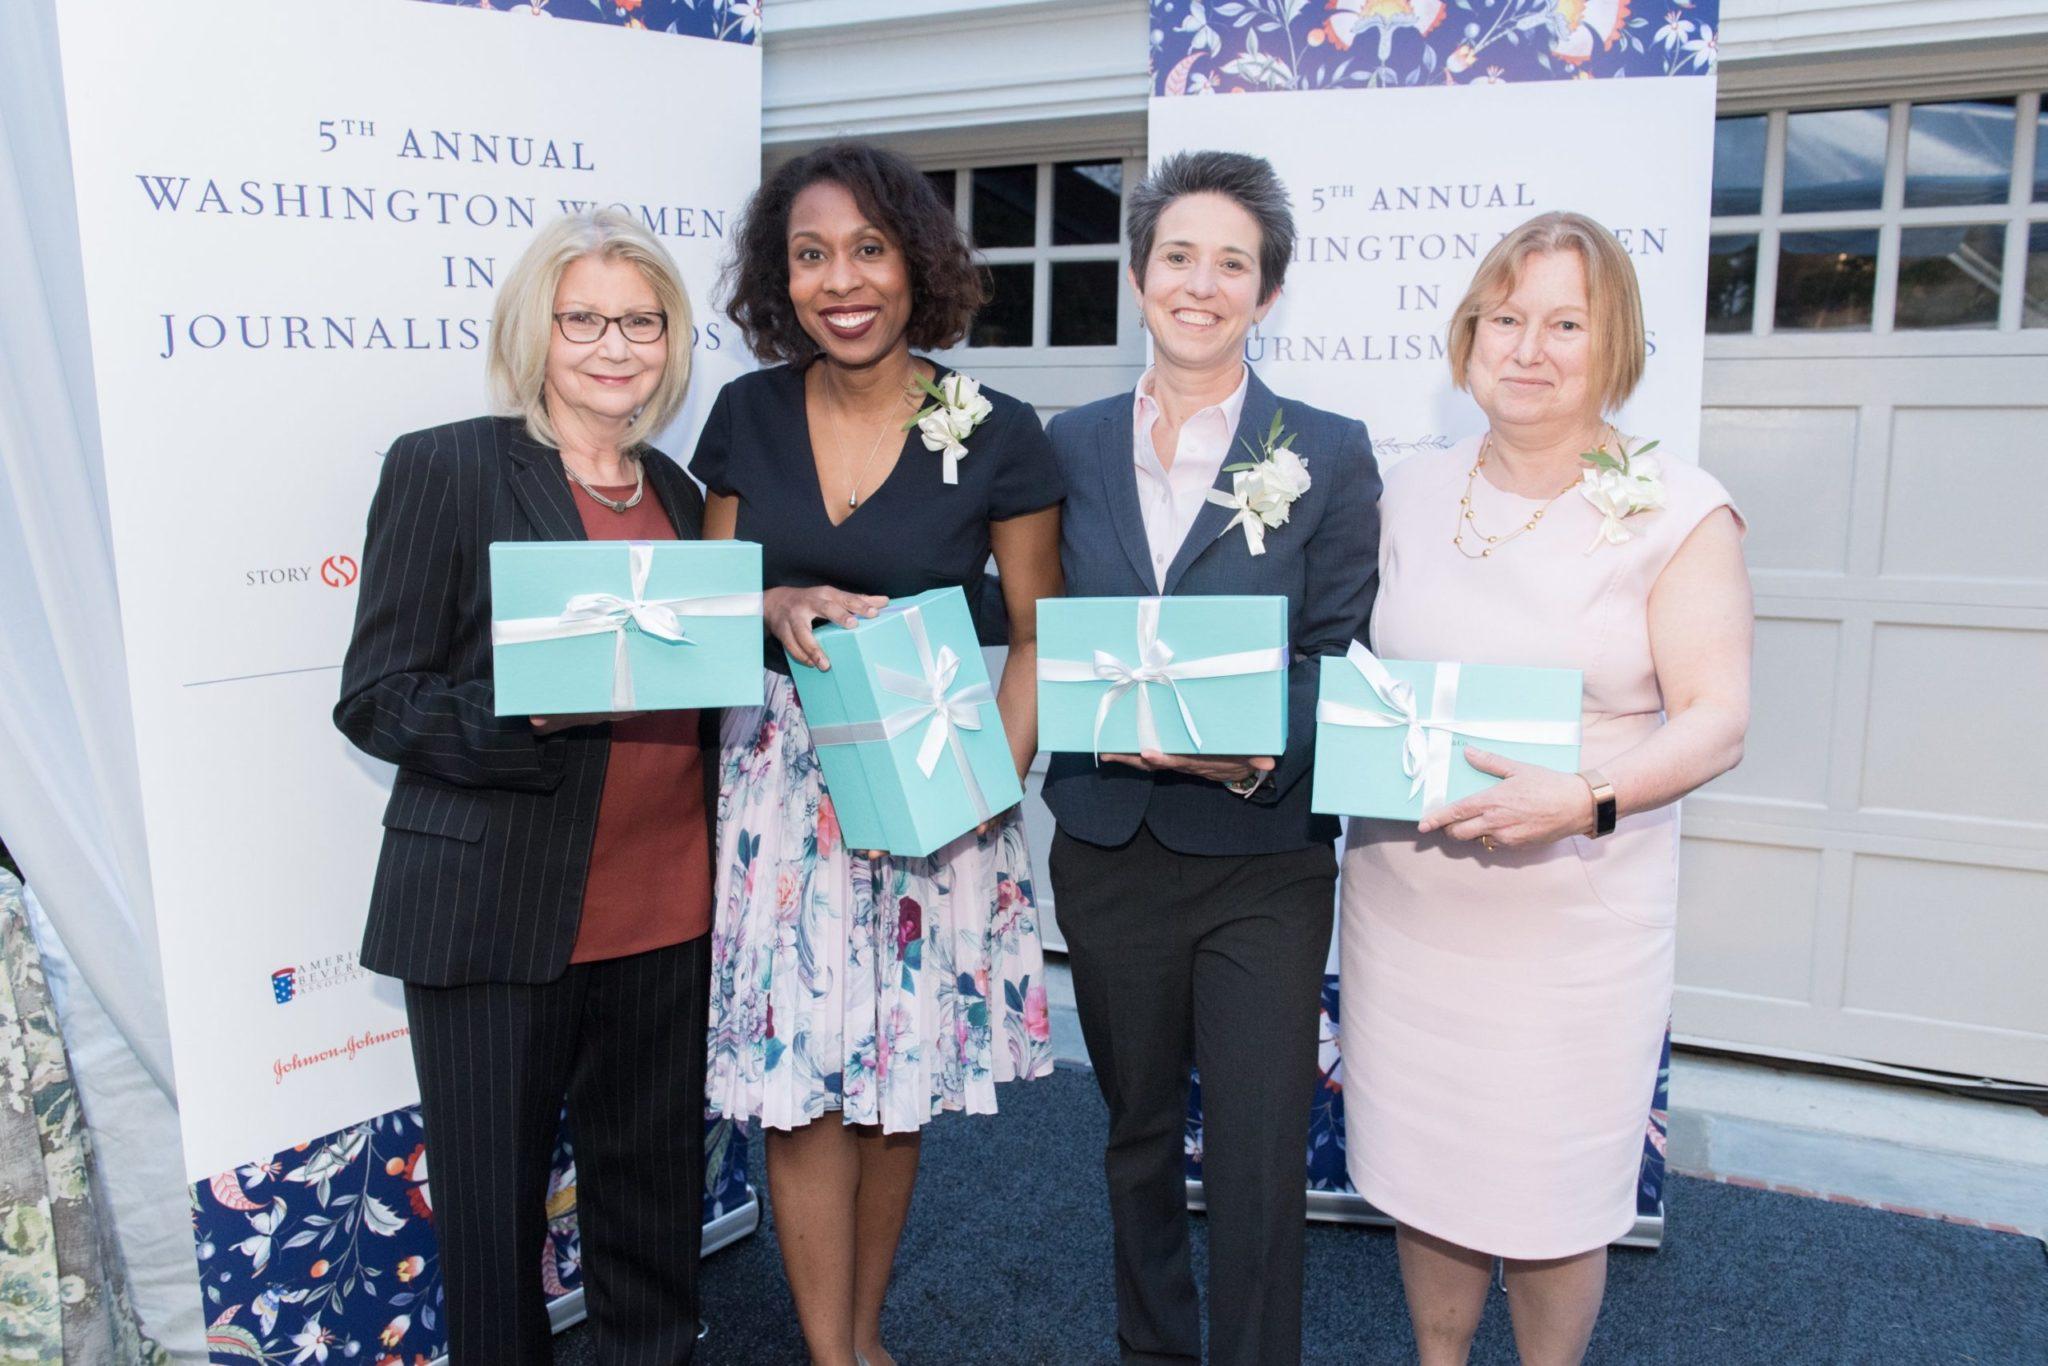 PHOTOS: 5th Annual Washington Women in Journalism Awards